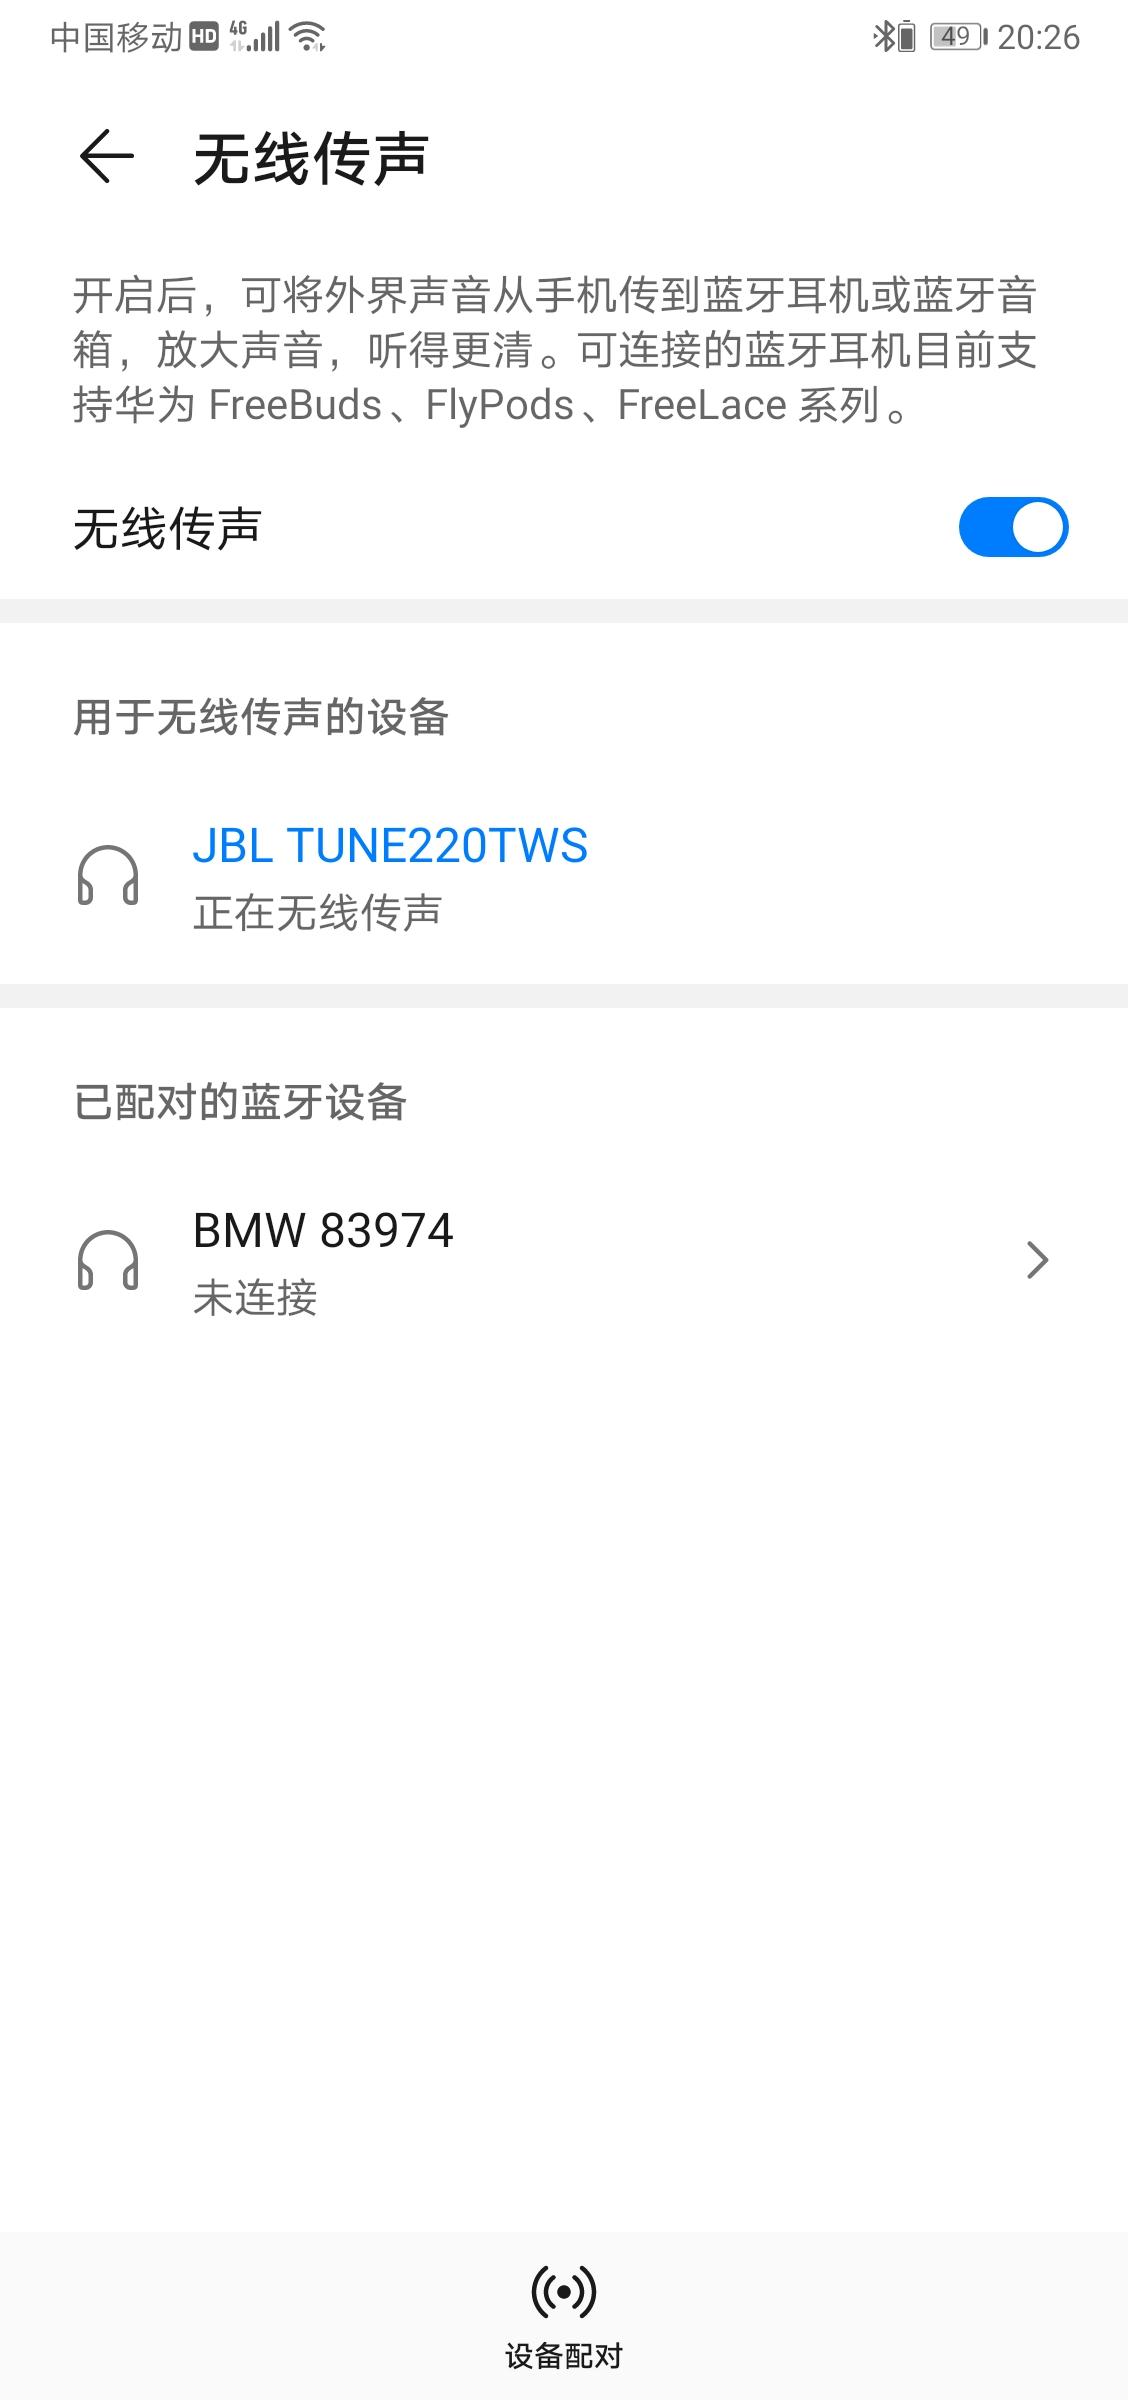 Screenshot_20200514_202626_com.android.settings.jpg